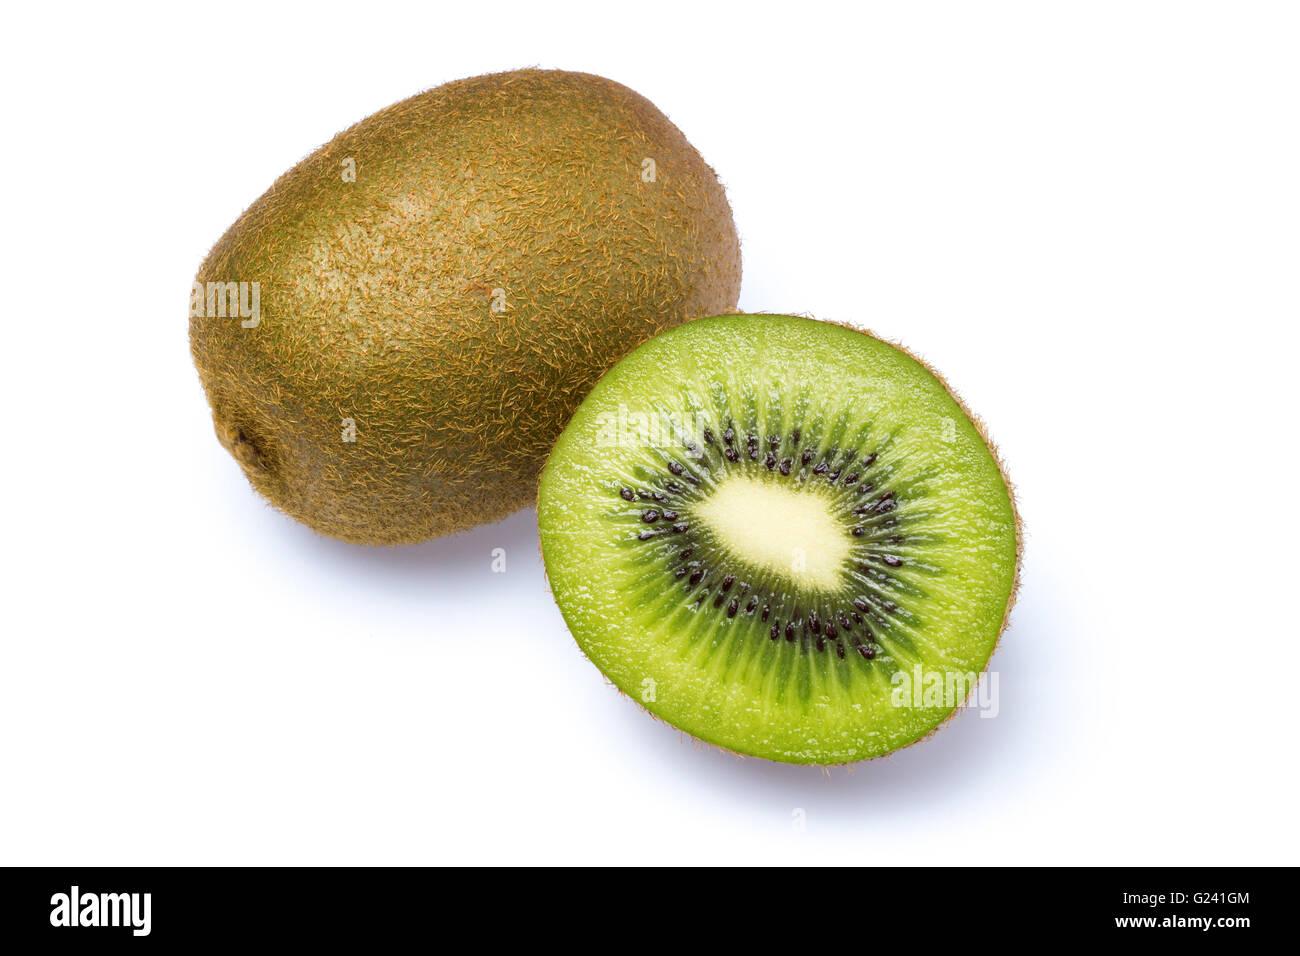 A whole and half kiwi as Cut . - Stock Image